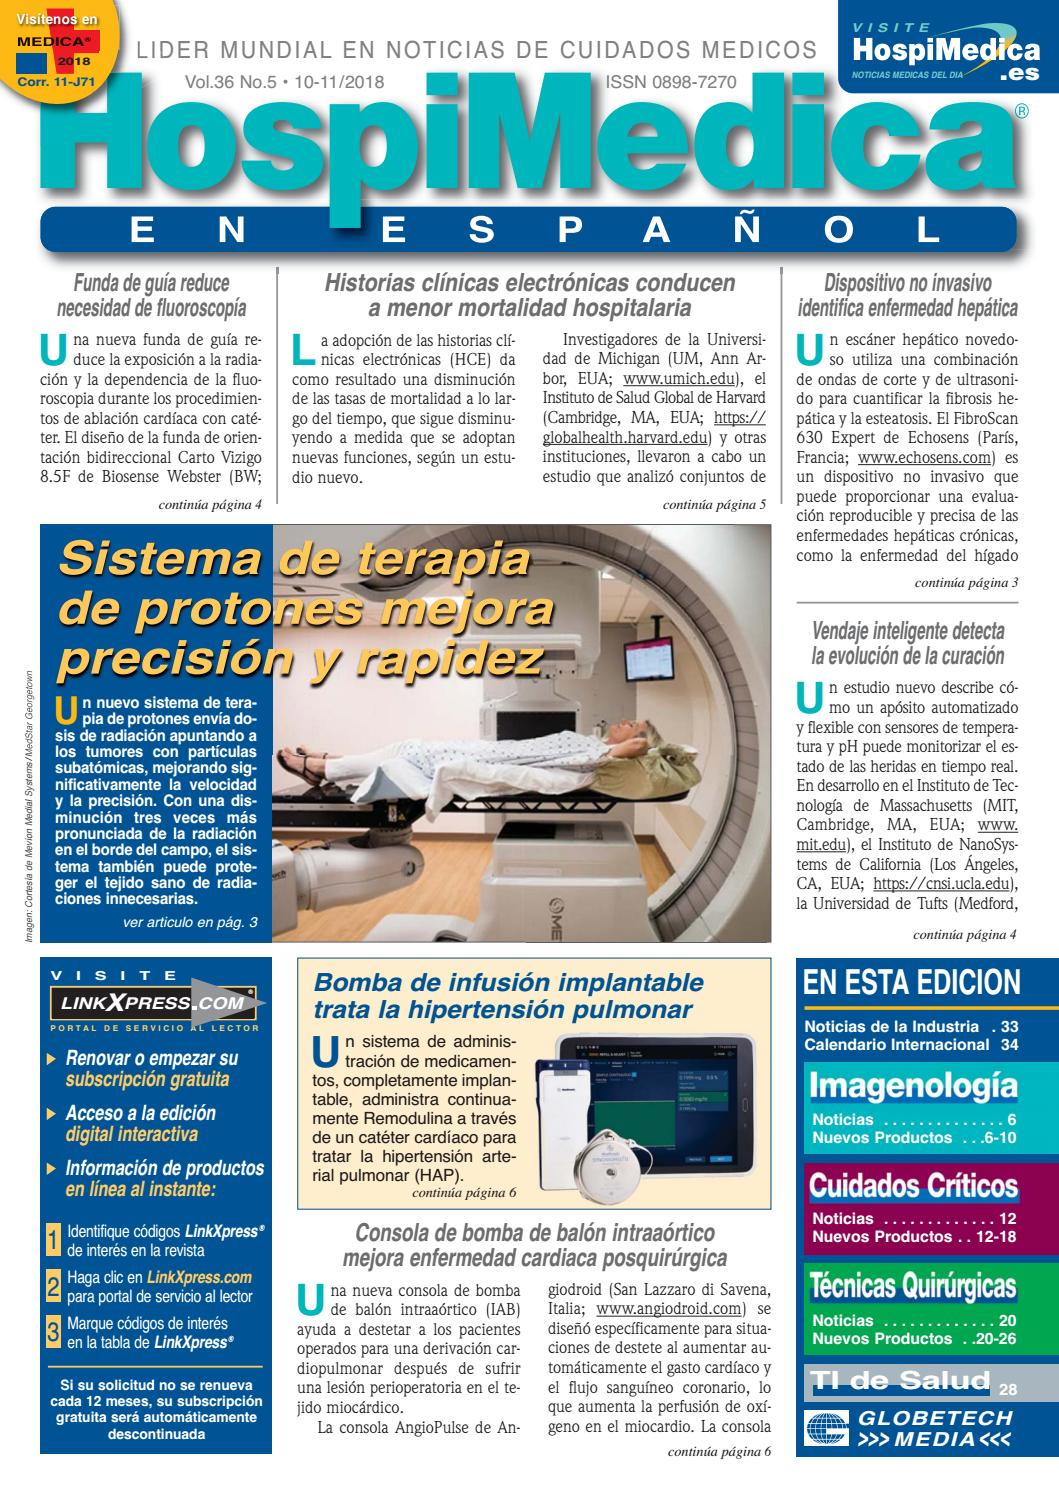 seguimiento de próstata rmn multiparamétrico italiano